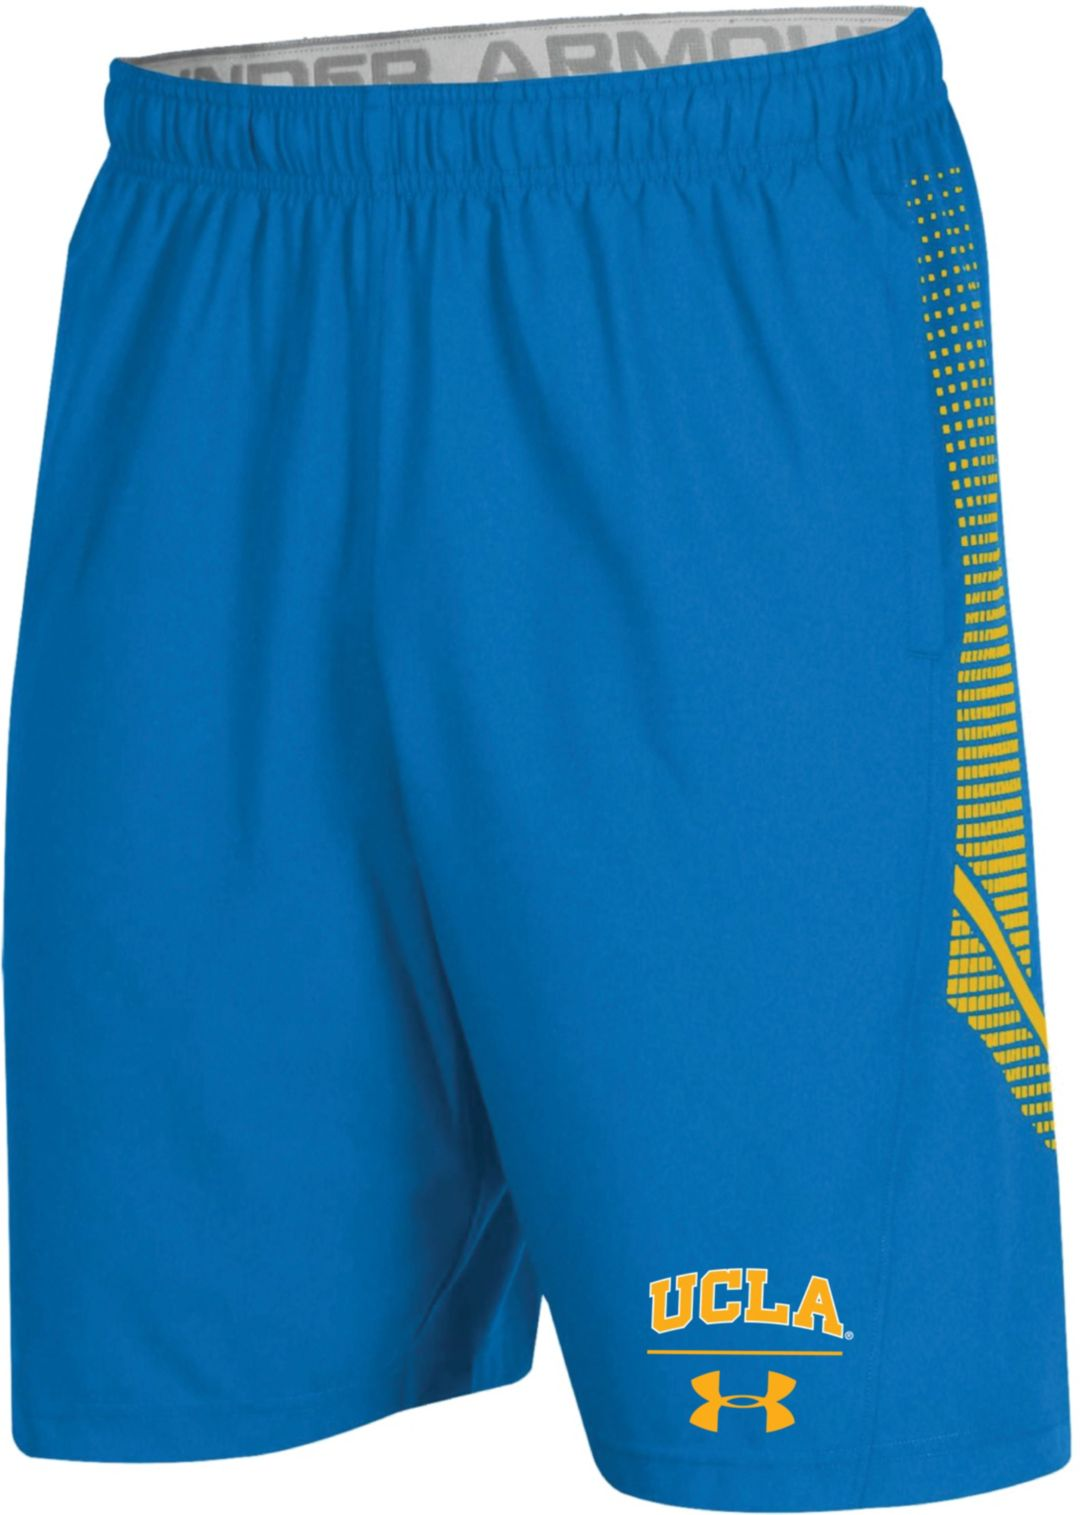 huge discount 82d91 43234 Under Armour Men s UCLA Bruins True Blue Sideline Pinnacle Shorts.  noImageFound. 1